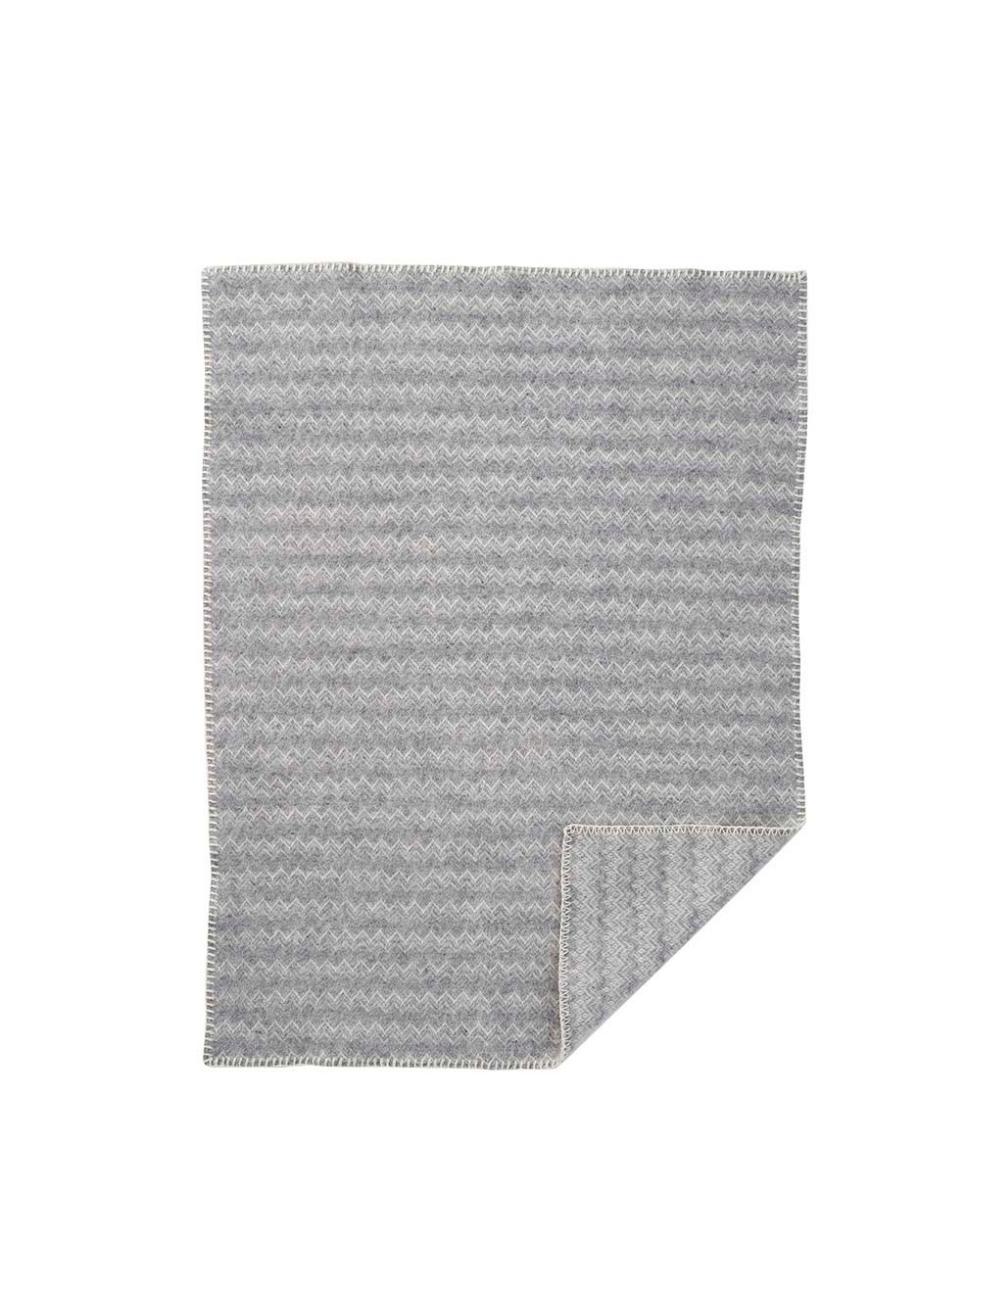 Summit Baby Stone Blanket/Throw